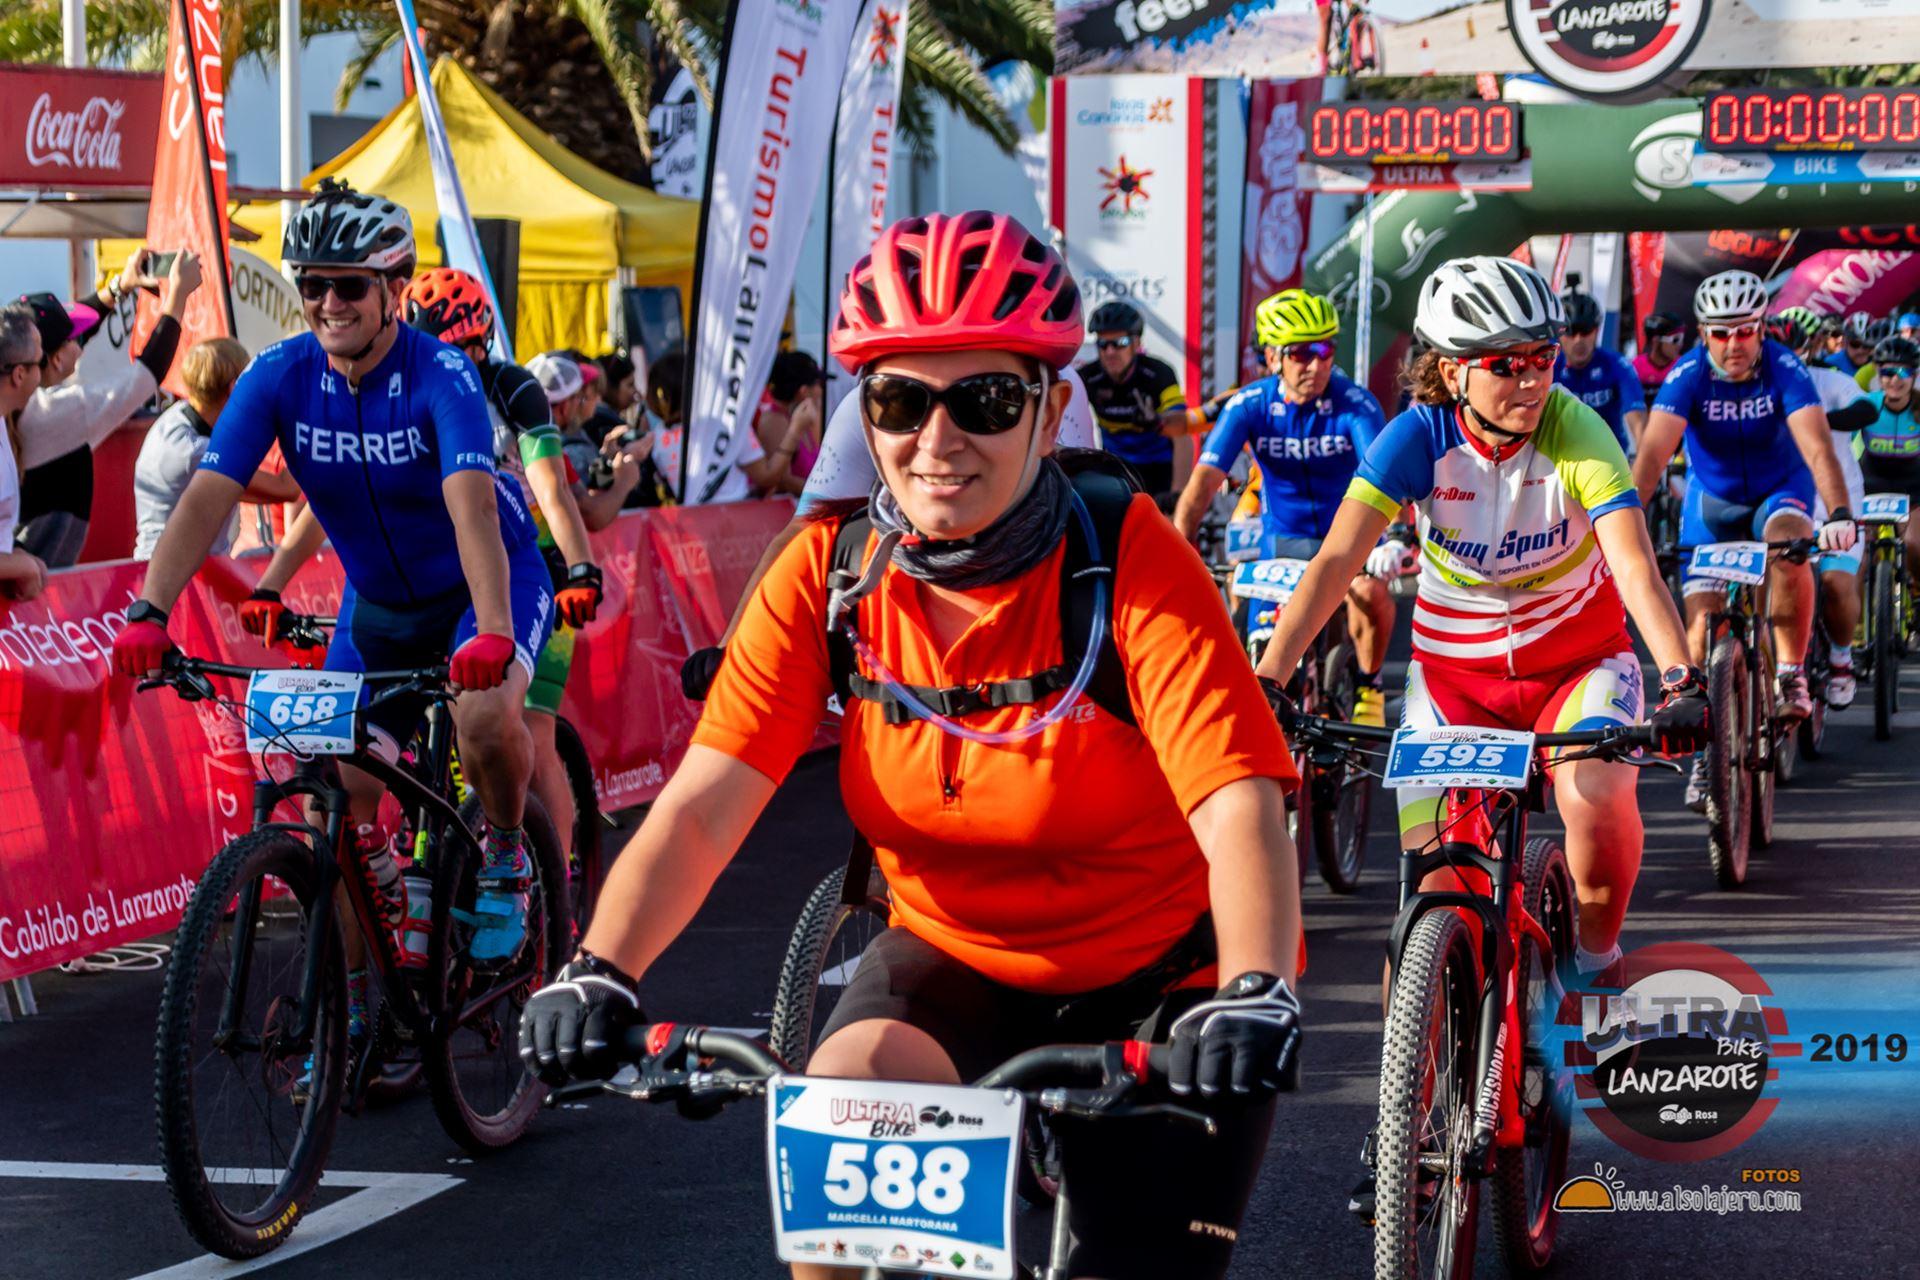 Salida 2ª Etapa Ultrabike 2019 Fotos Alsolajero.com-73